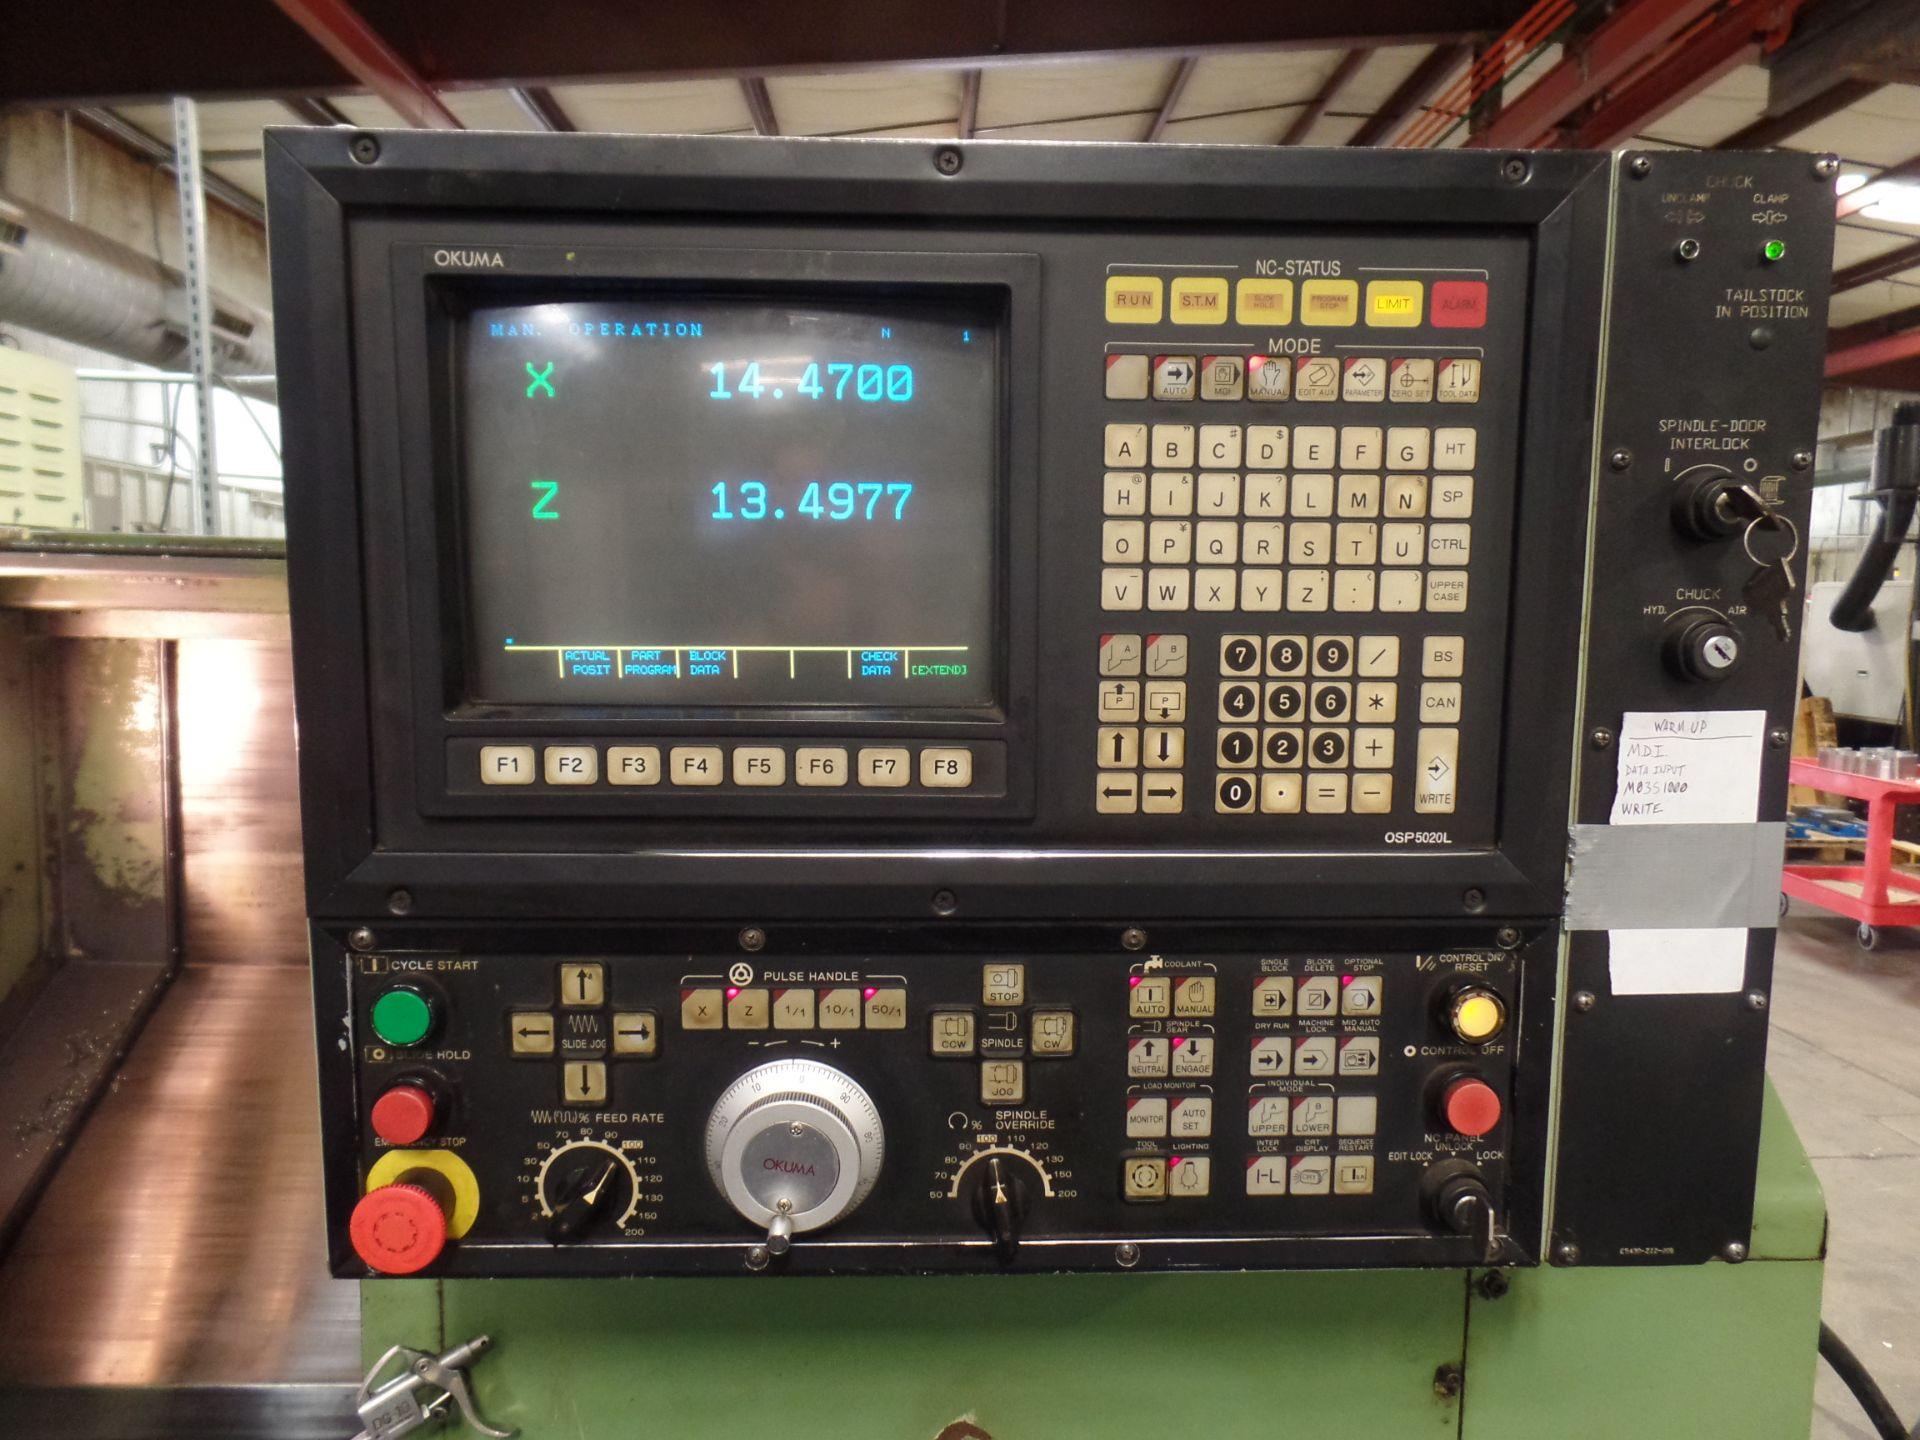 "1996 Okuma LB 25 2 Axis CNC Lathe, 5020 control , chip conveyor, 10"" chuck SN: 02109123 - Image 3 of 7"